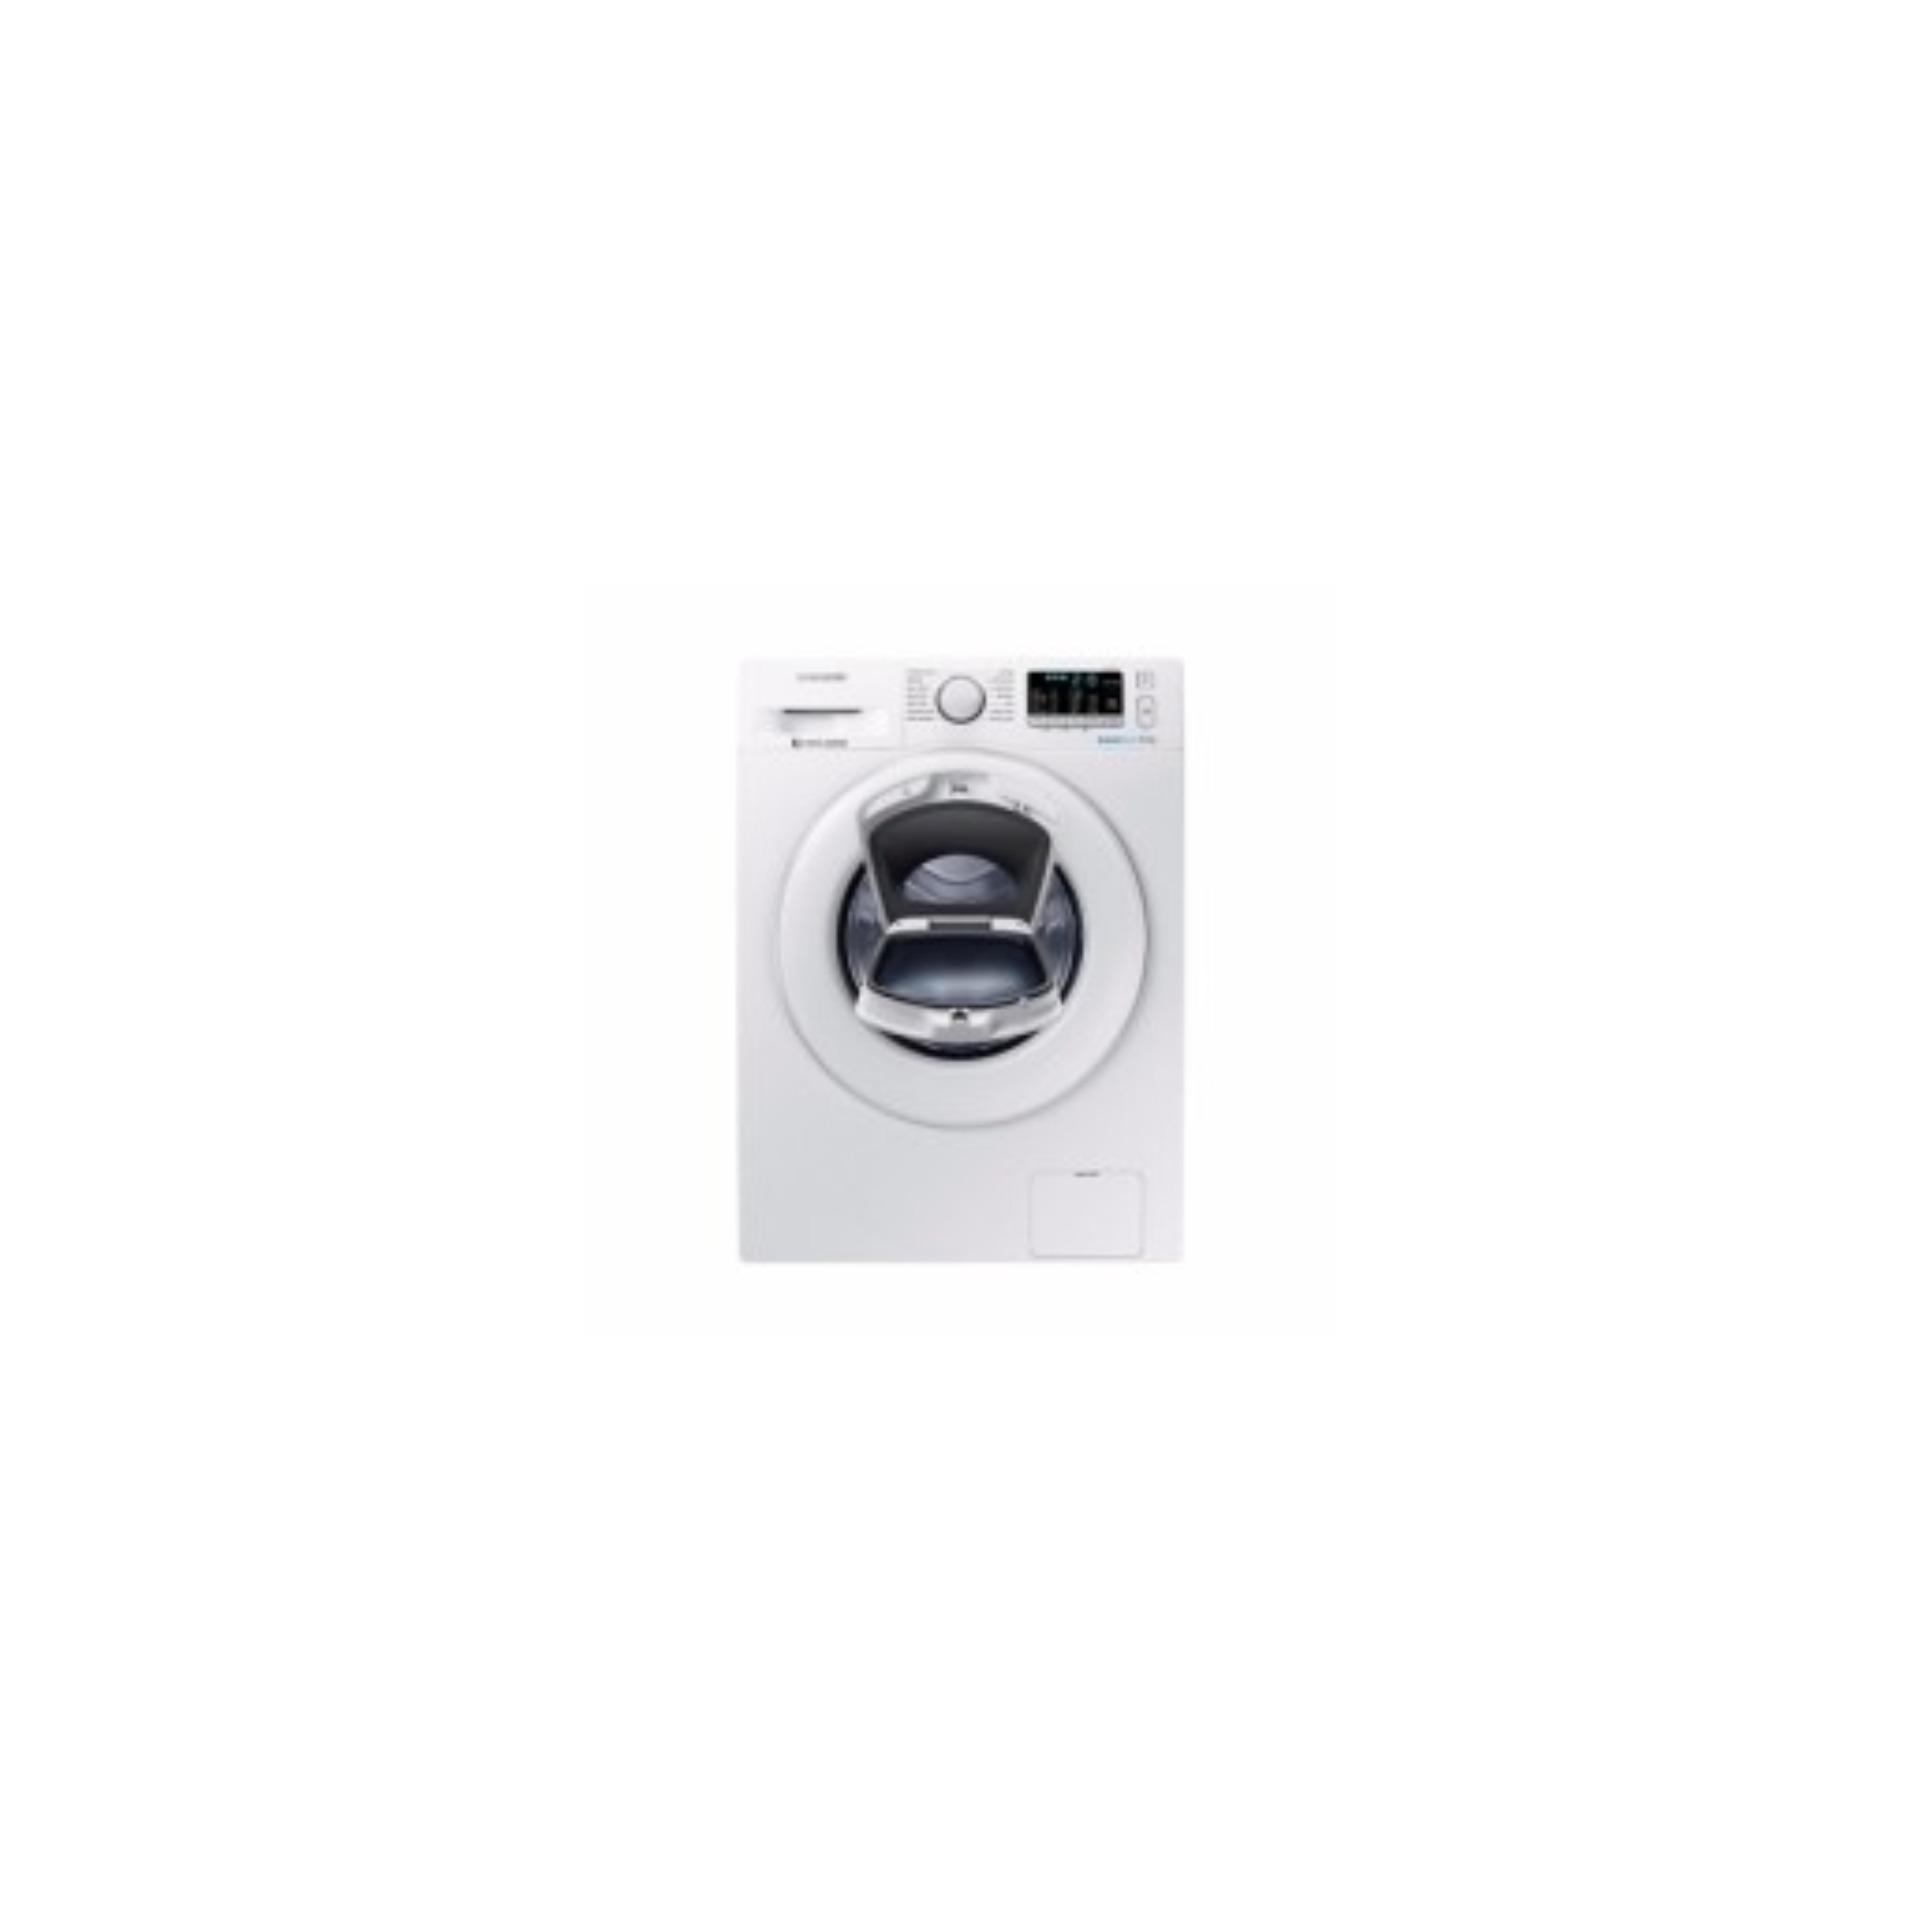 Samsung Frontload Washer 65kg Ww65j3283lw Daftar Update Harga Ww65j3283lwse Ww3000j Diam Washing Machine 65 Kg Front Loading 85k5410w Putih